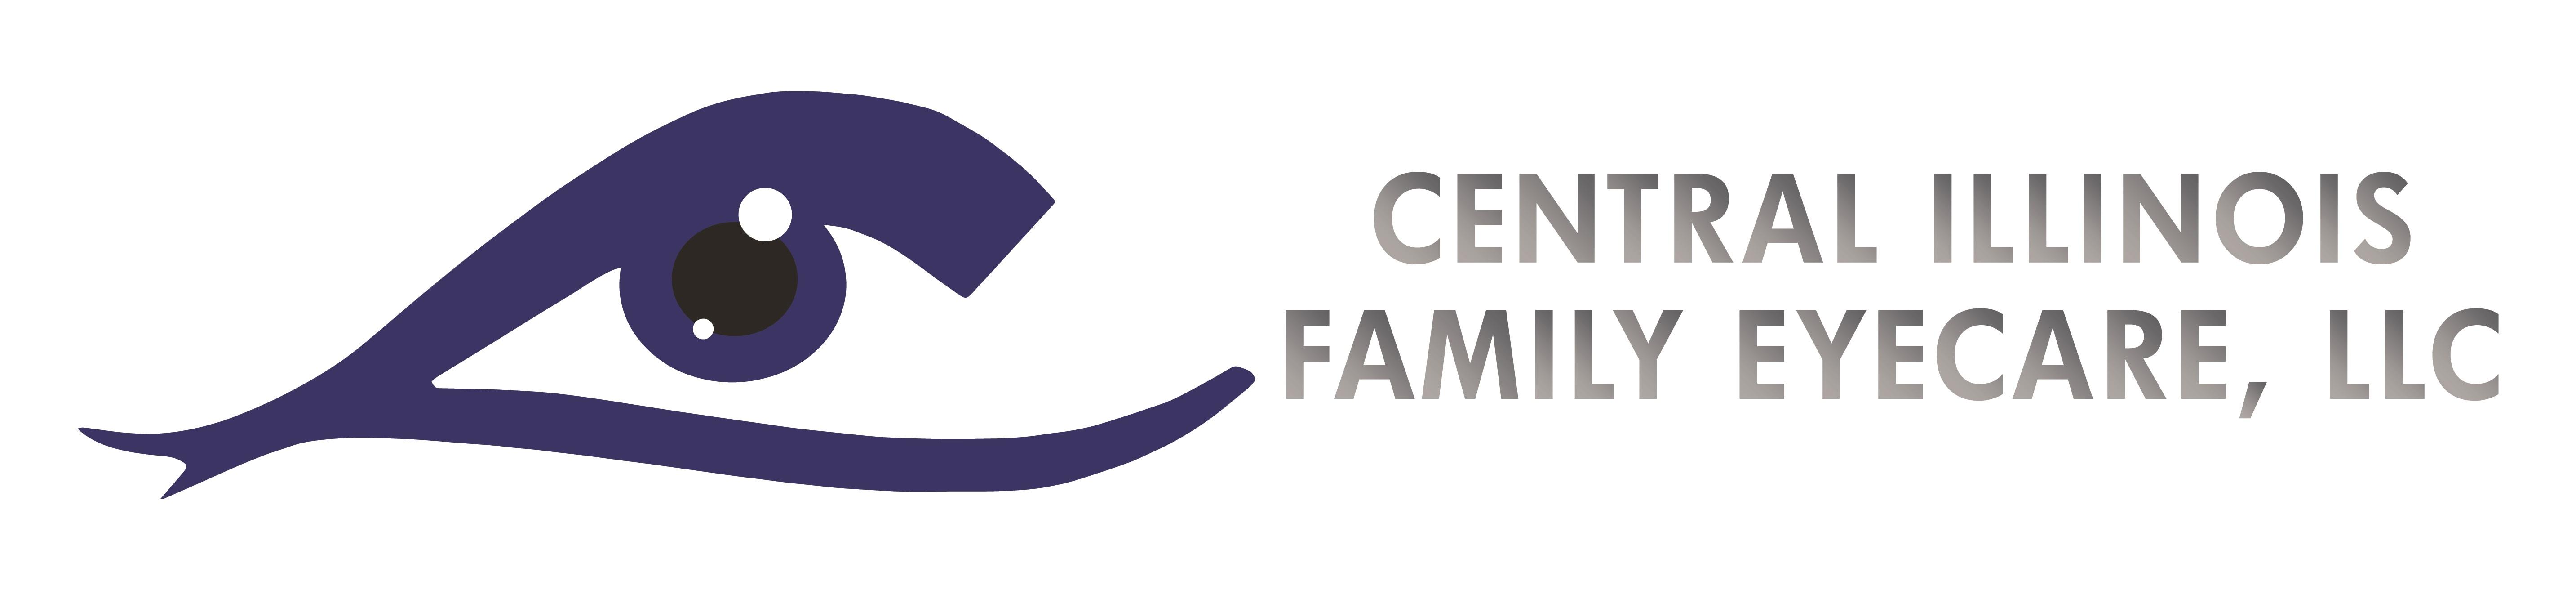 Central Illinois Family Eyecare